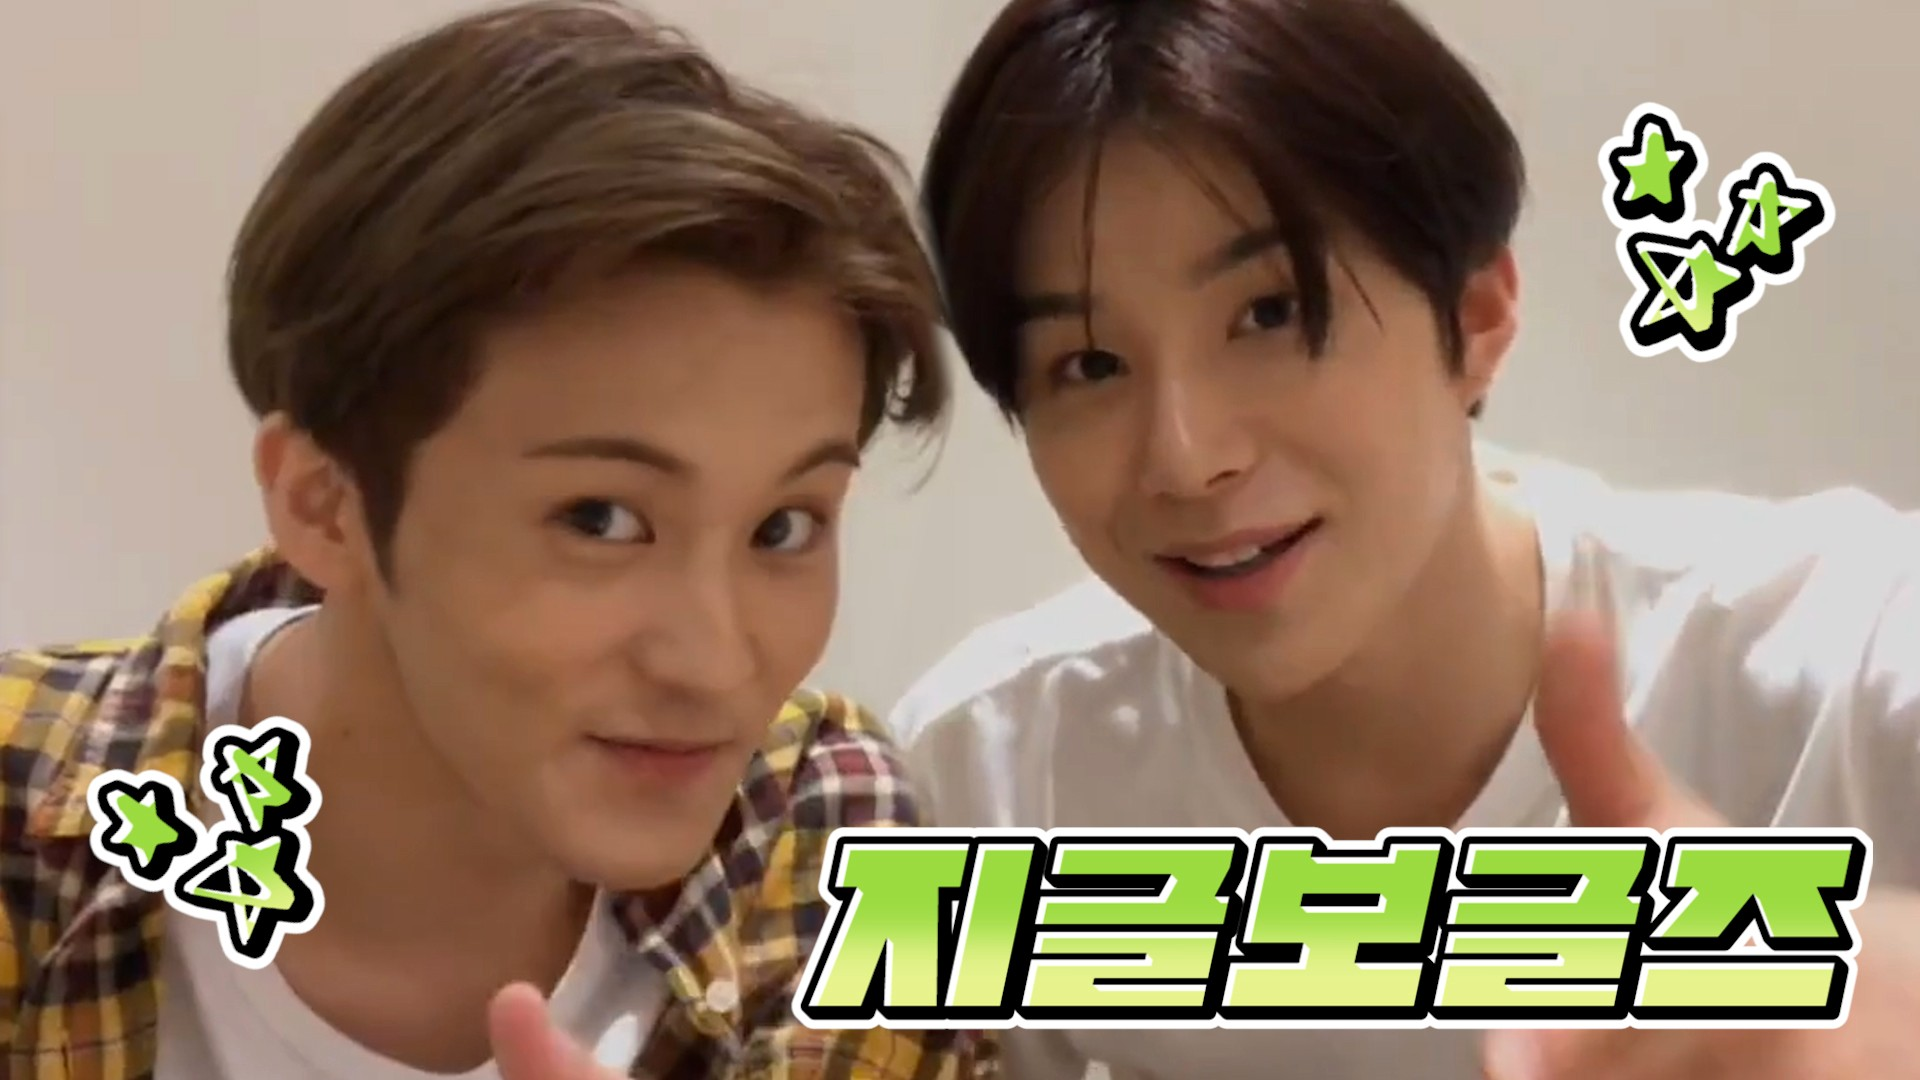 [NCT] 울 지글보글즈만 있다면 세상 행복 내가 다 가ㅠ졌ㅠ어ㅠ (MARK&JUNGWOO talking about recent episode)